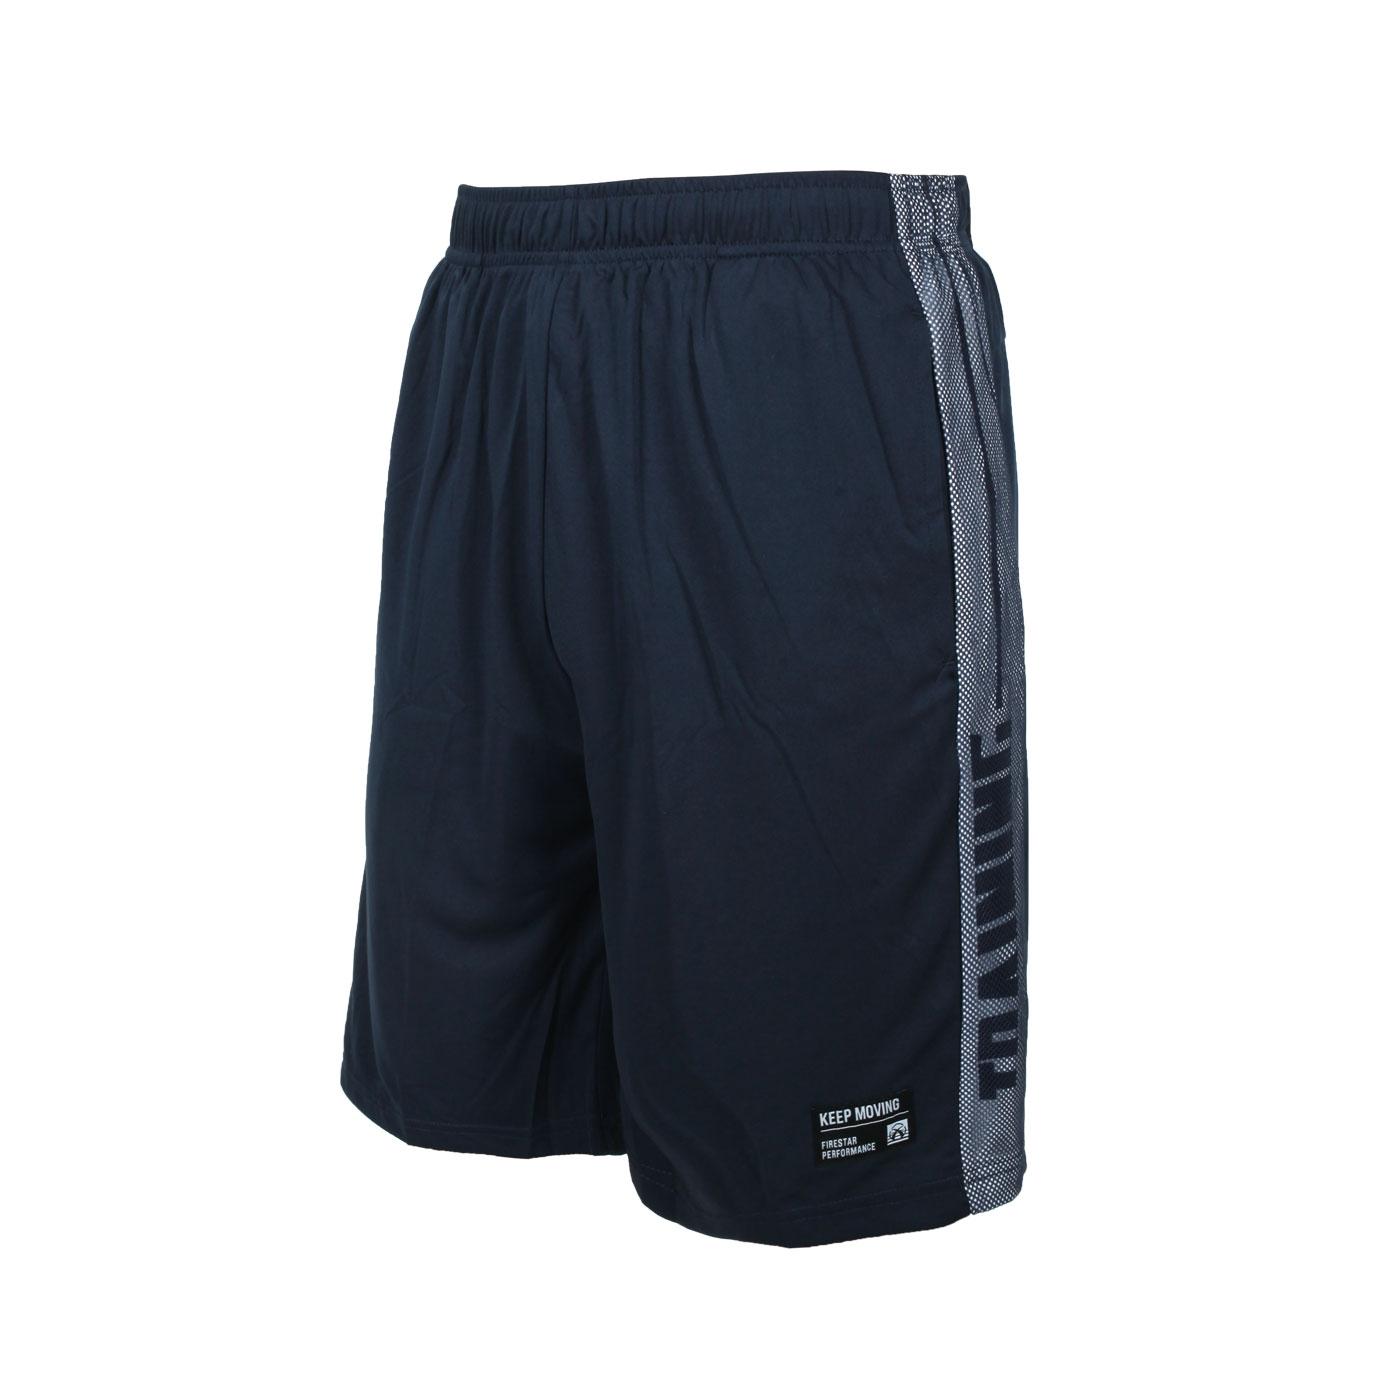 FIRESTAR 男吸排訓練籃球褲 B1702-93 - 丈青白